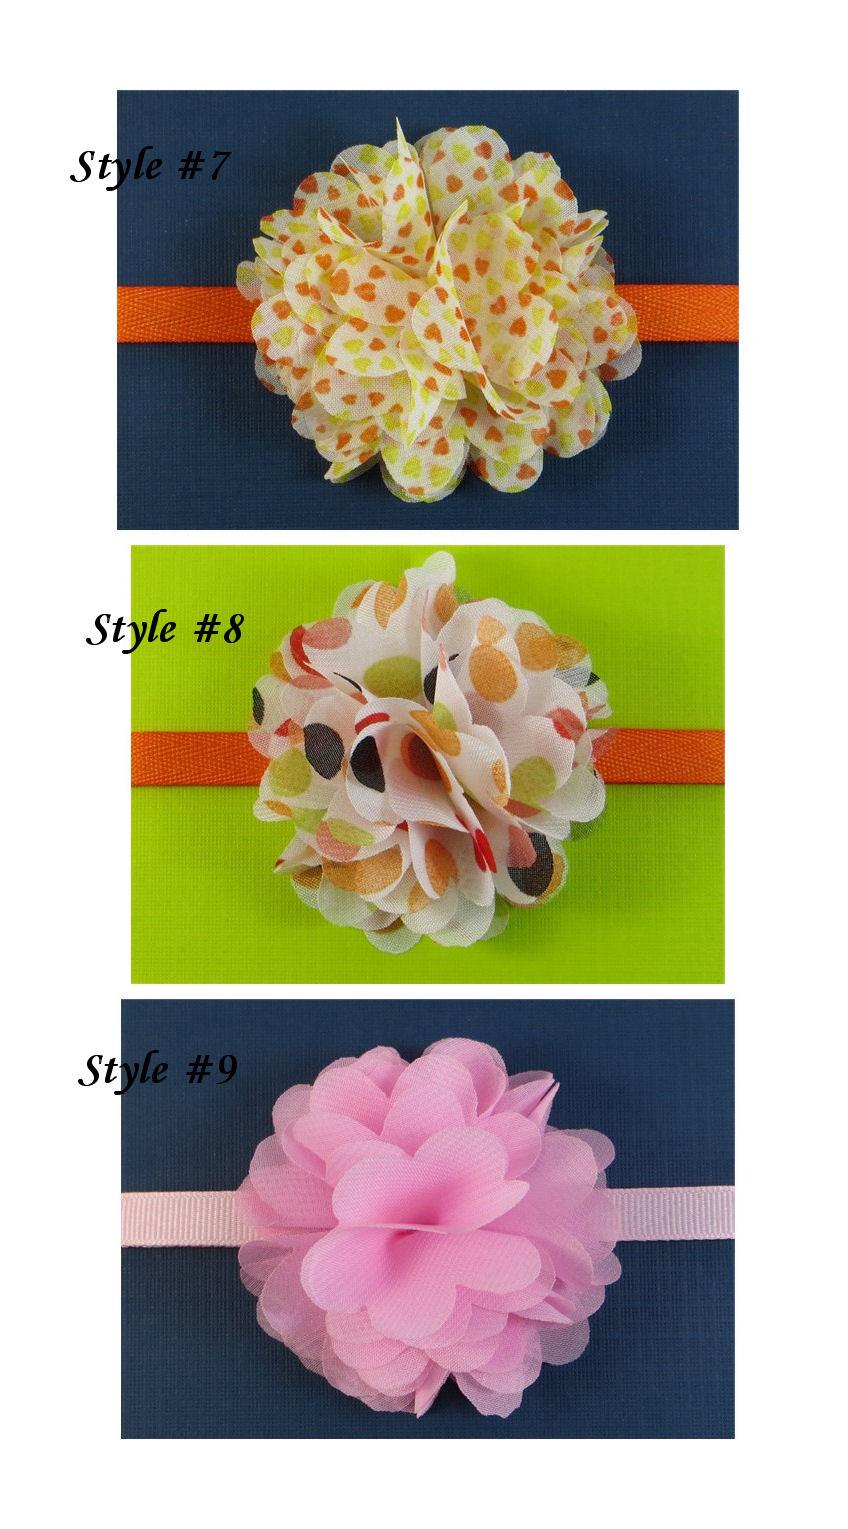 Spring Flower Collars Misstakens Boutique Online Store Powered